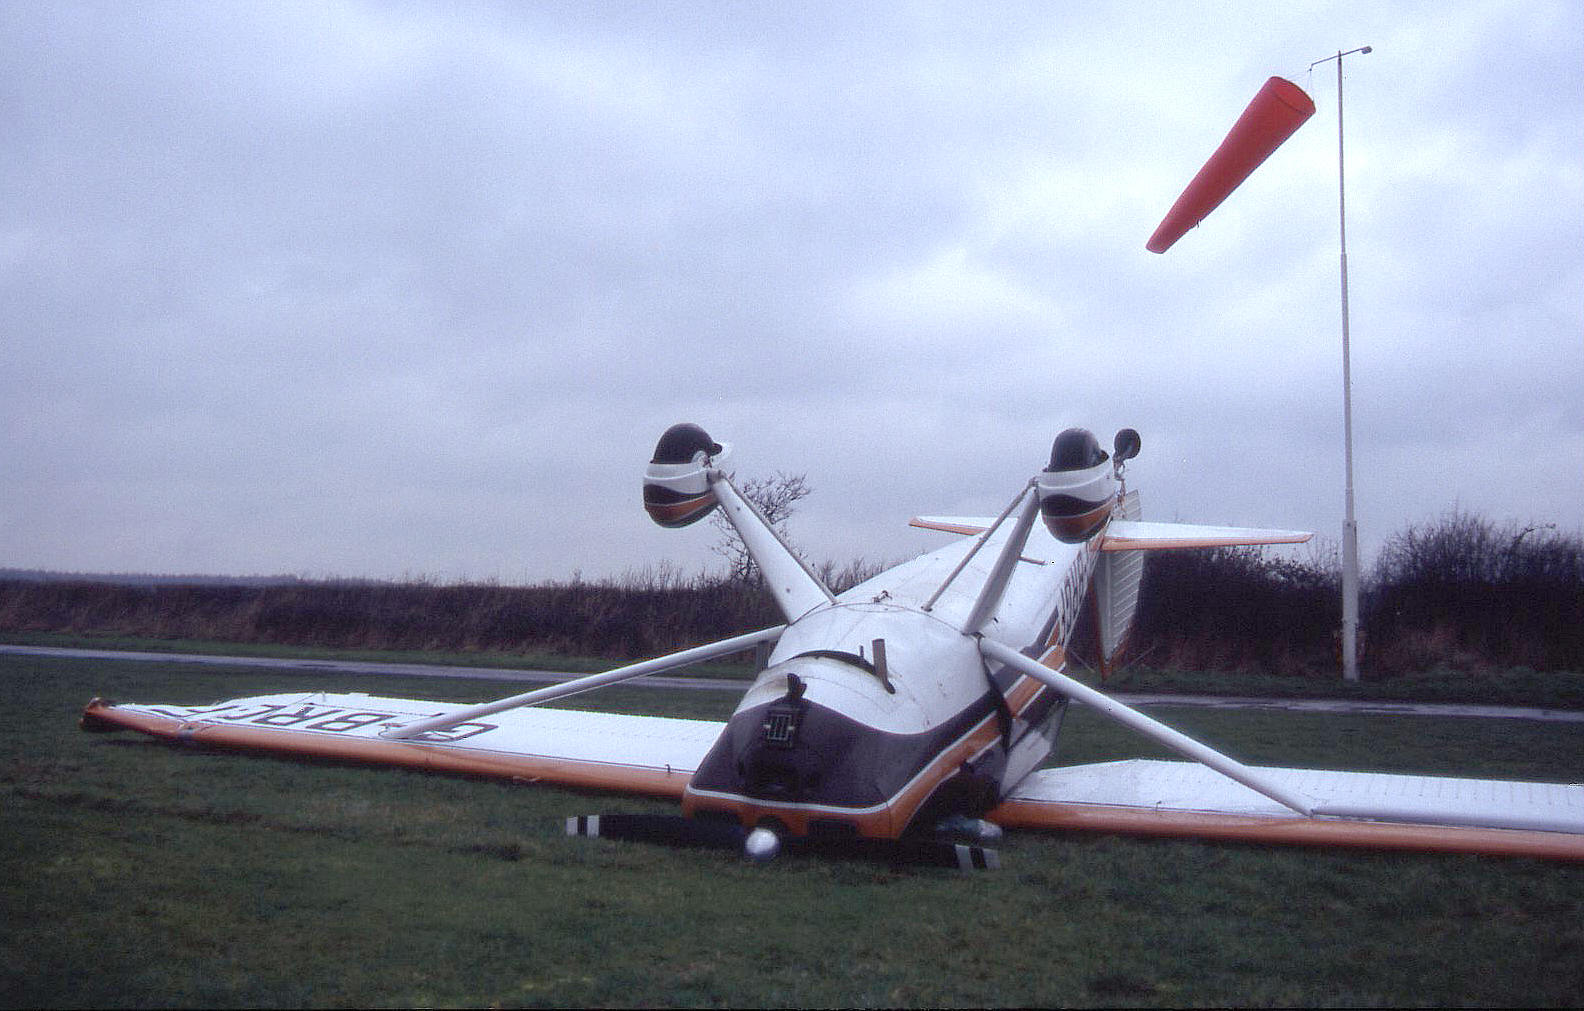 wycombe air park uk airfield guide rh ukairfieldguide net